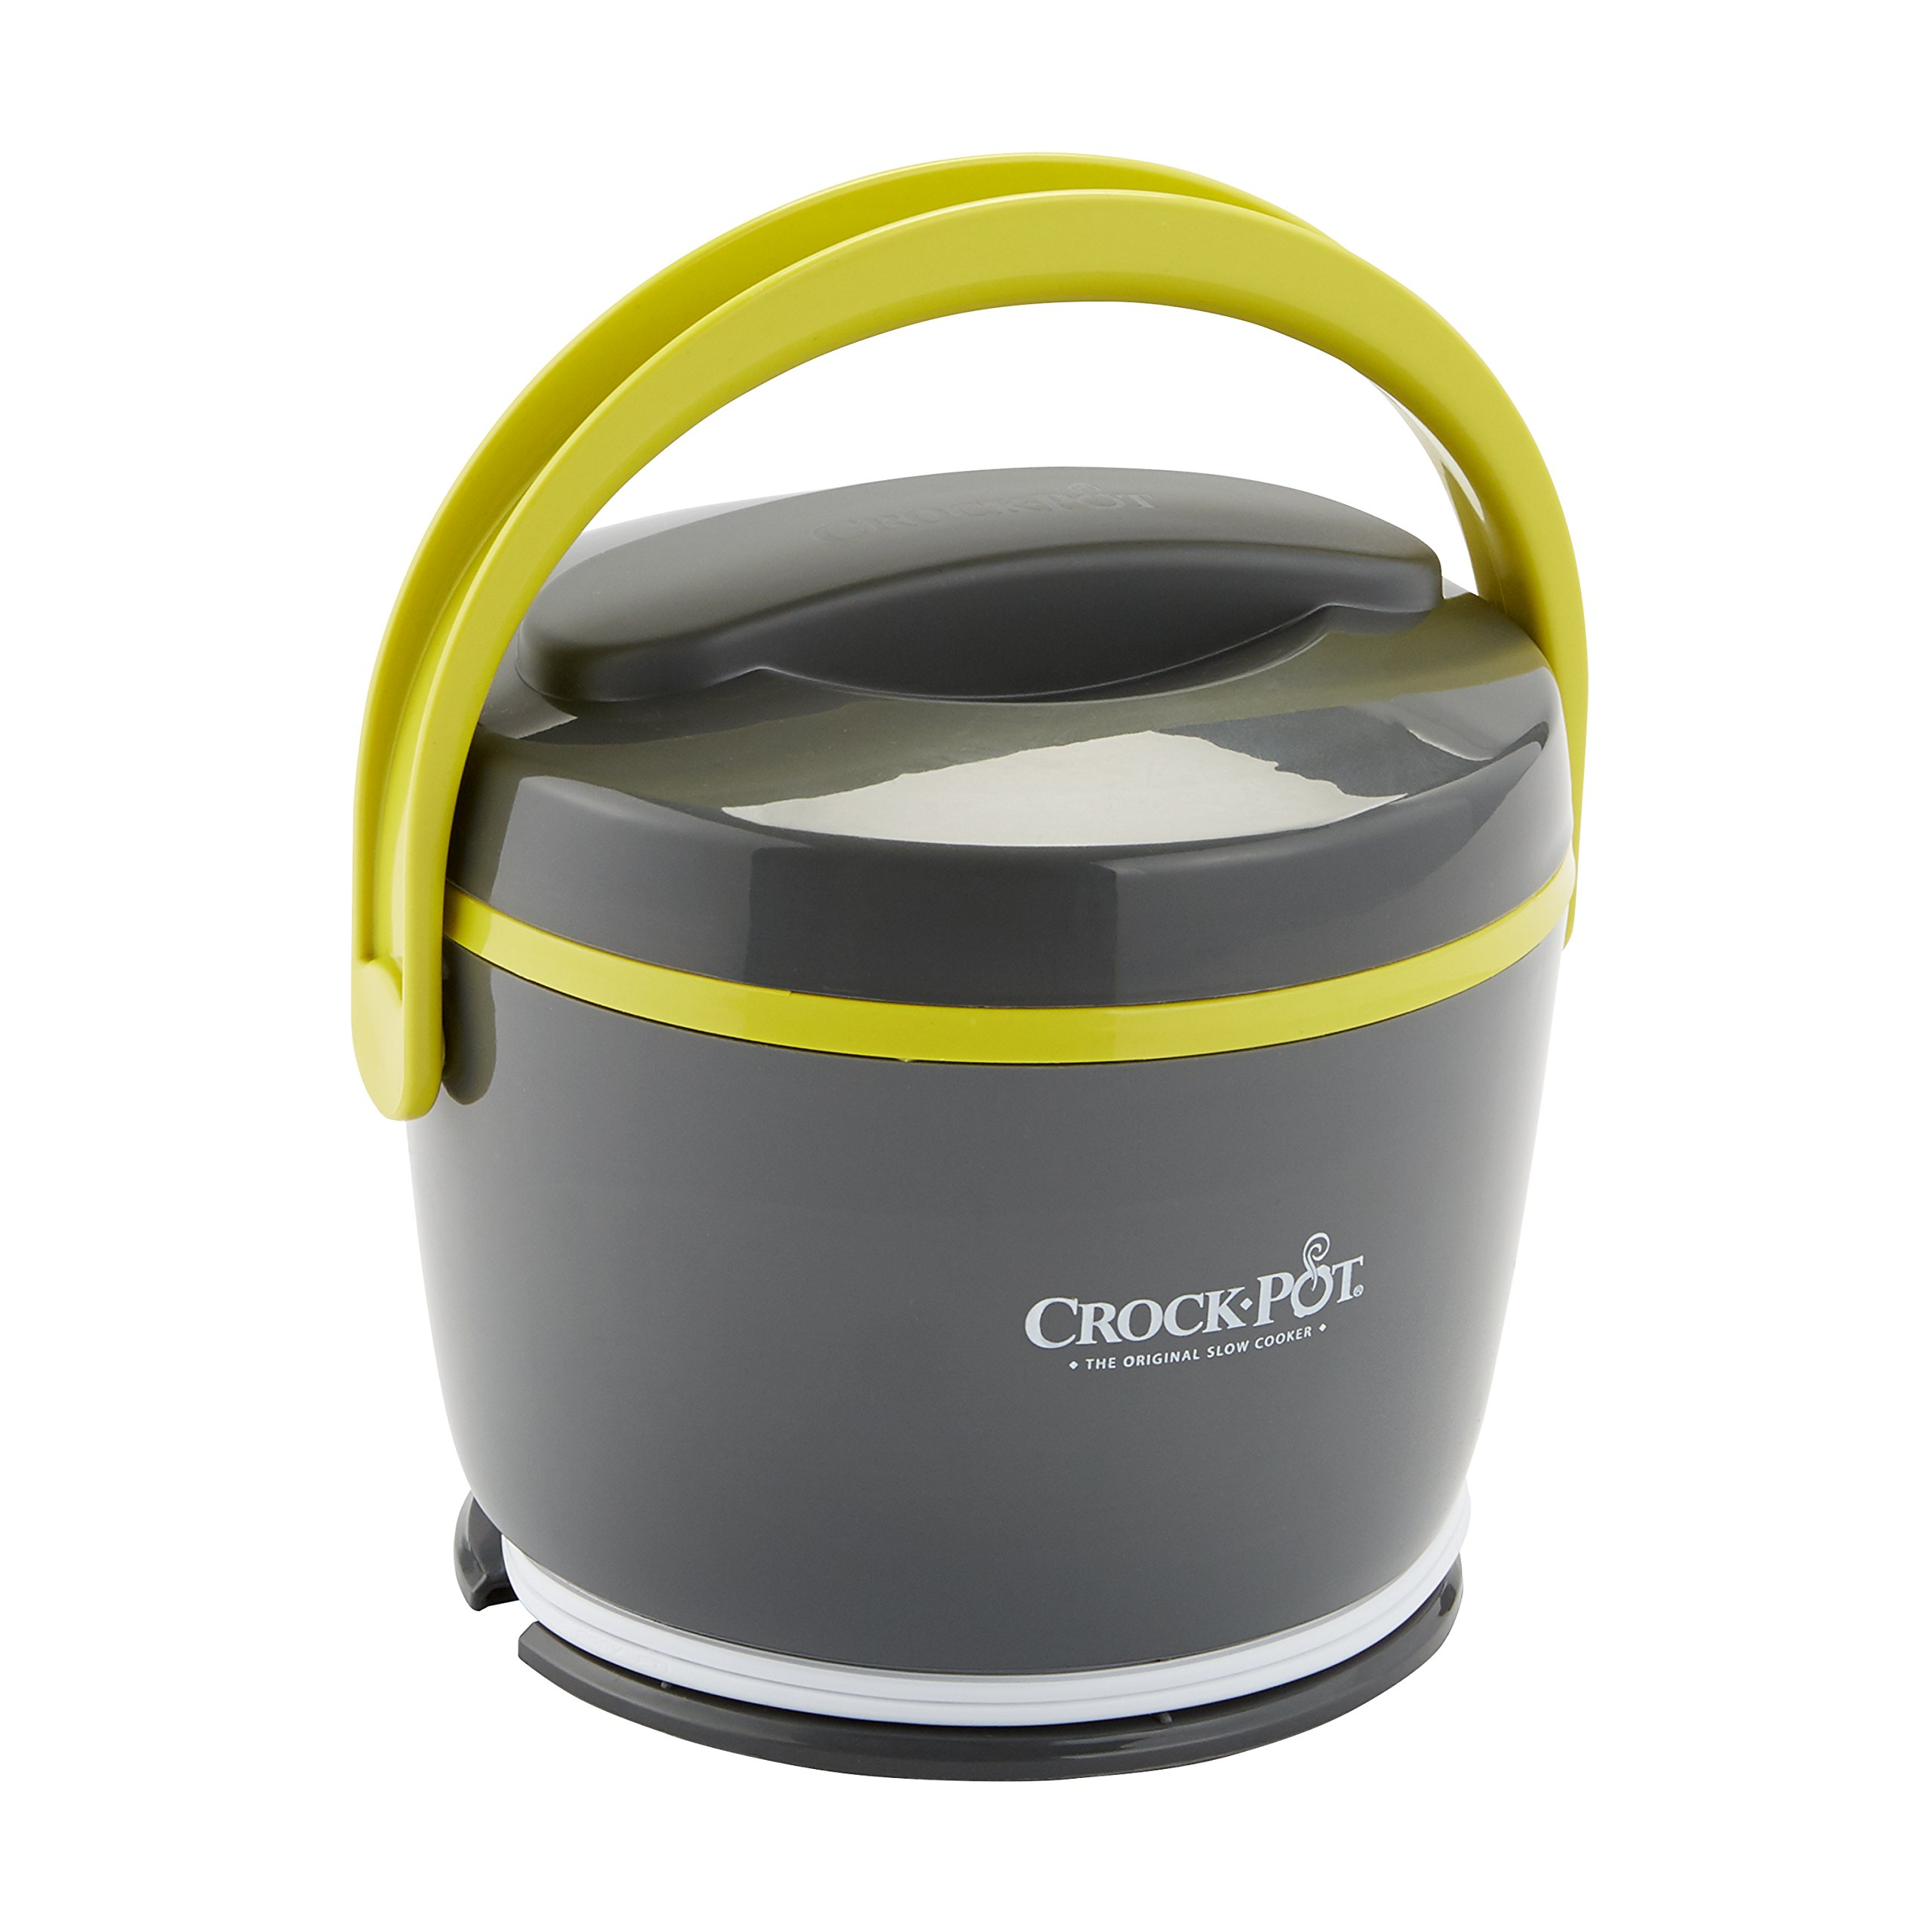 Crock-Pot Lunch Crock Food Warmer, Grey & Lime